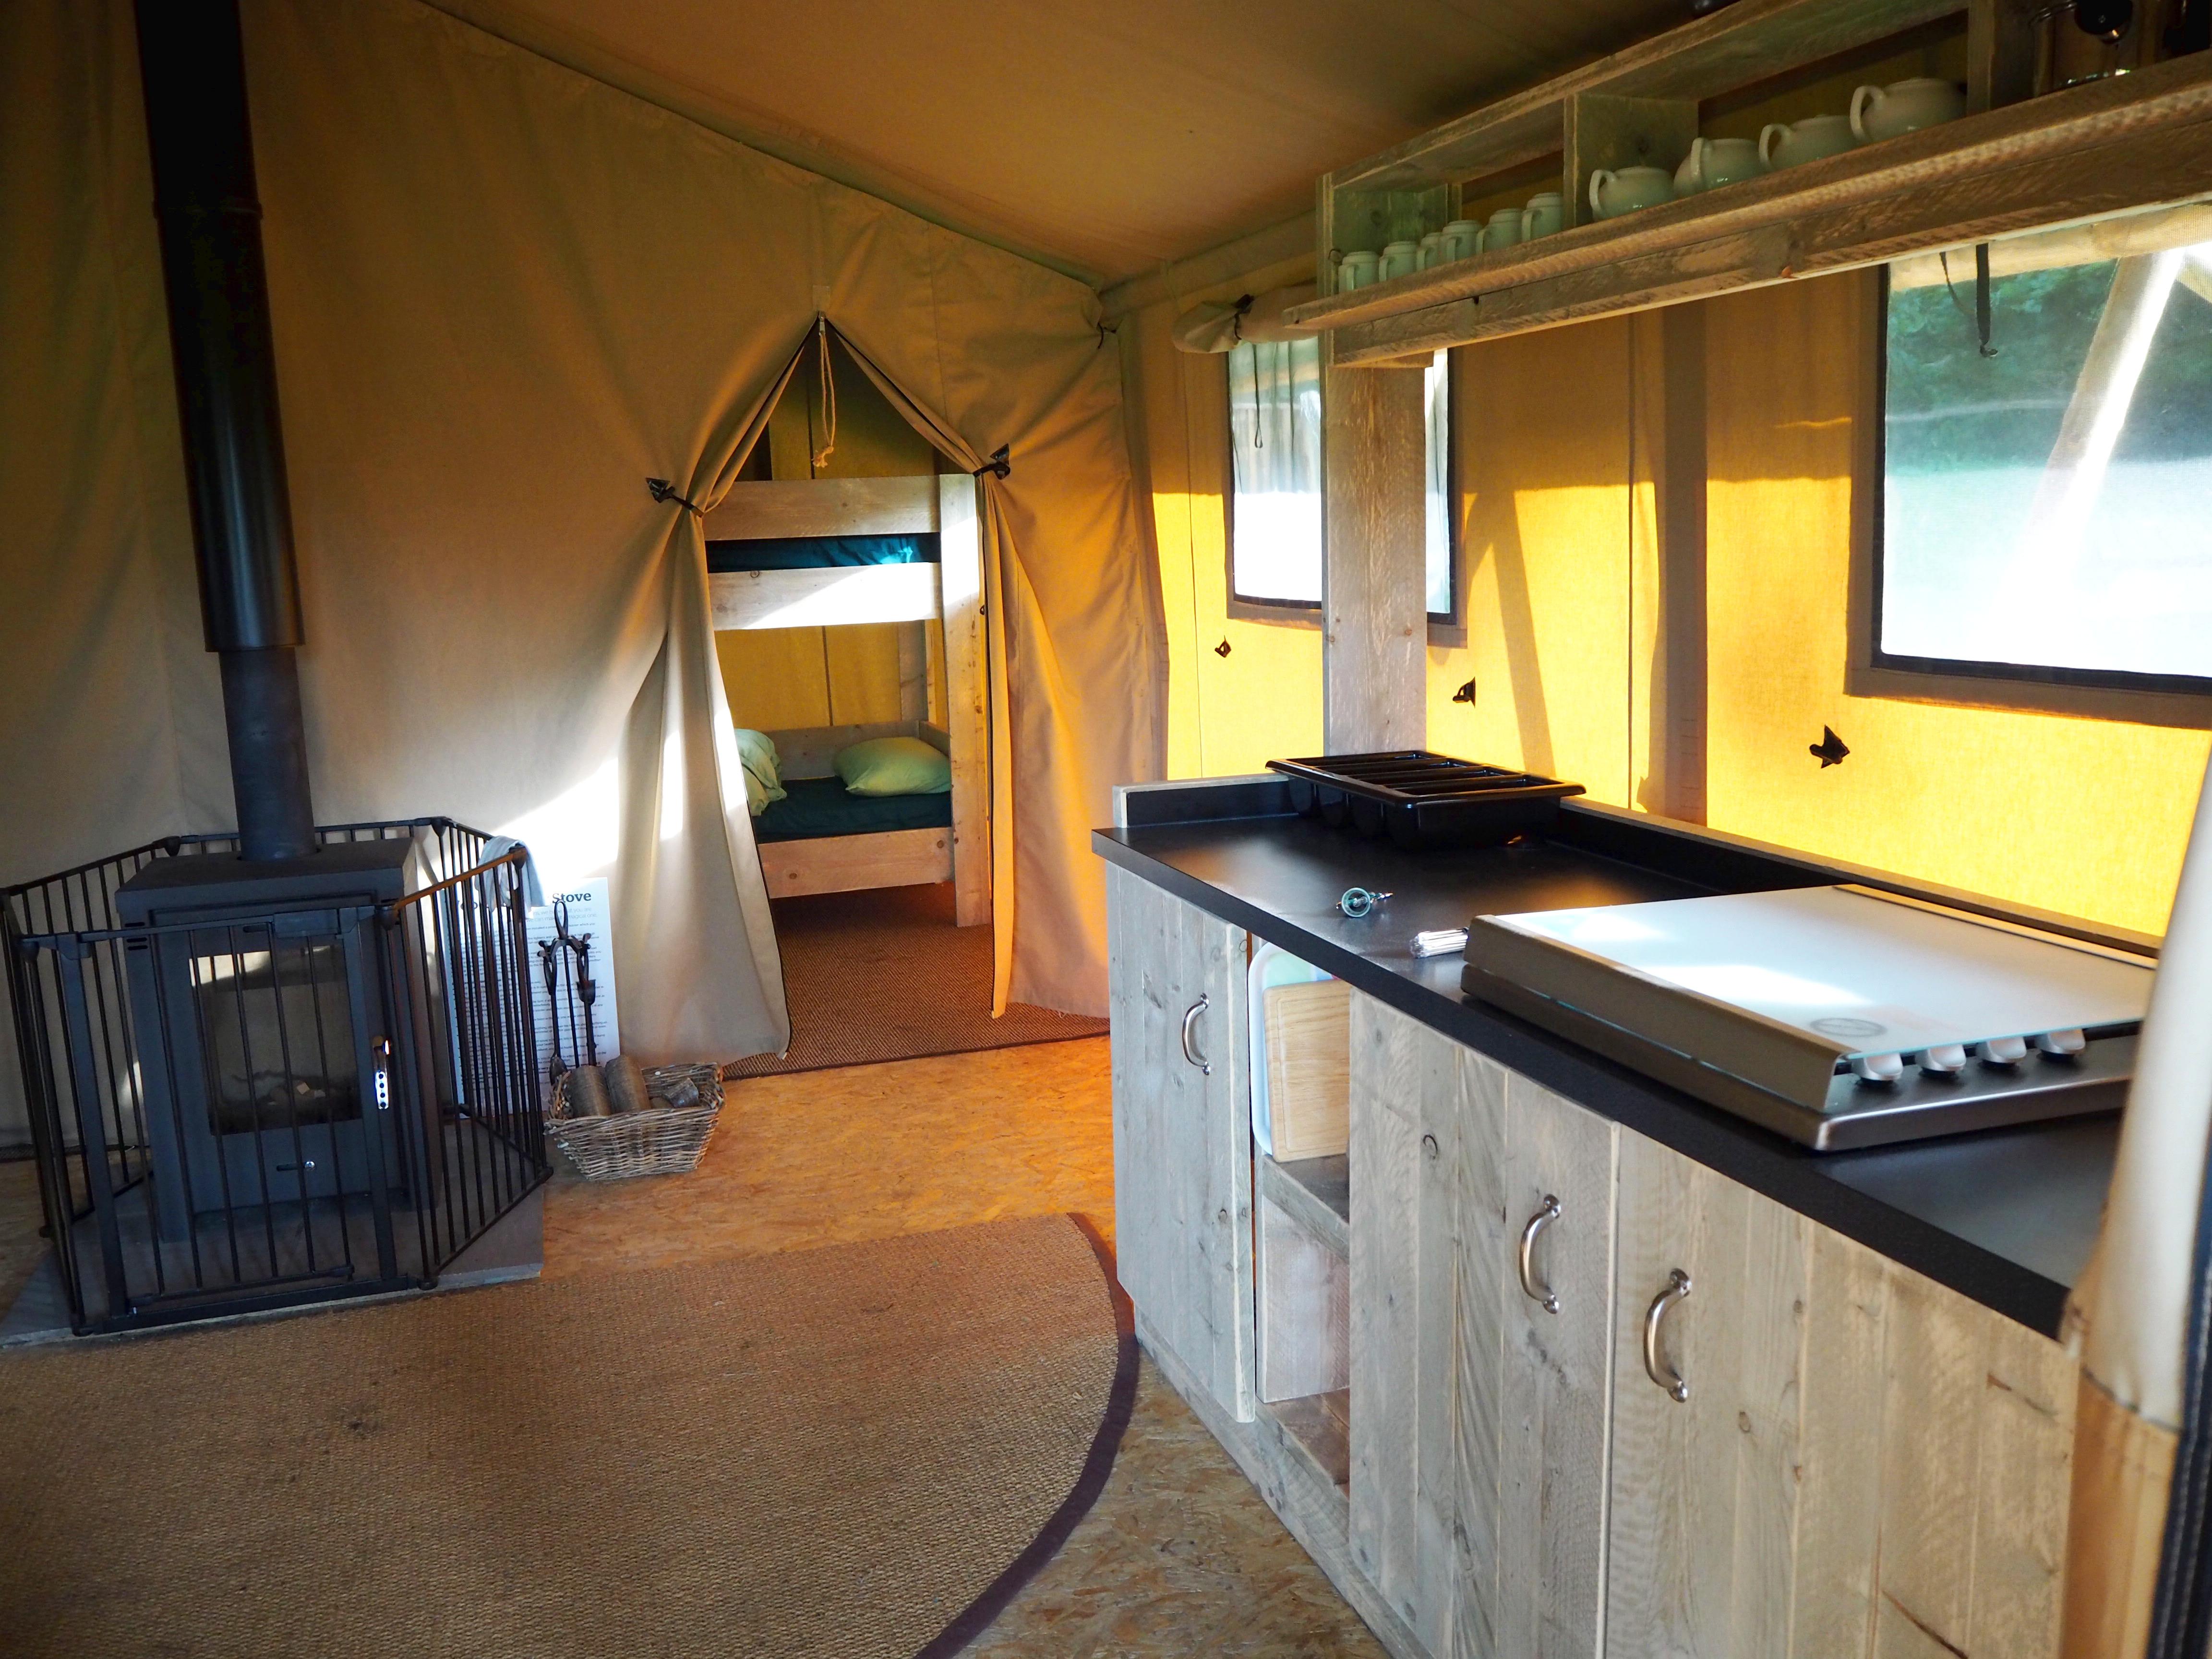 Safari Tent Kitchen at YHA Tanners Hatch